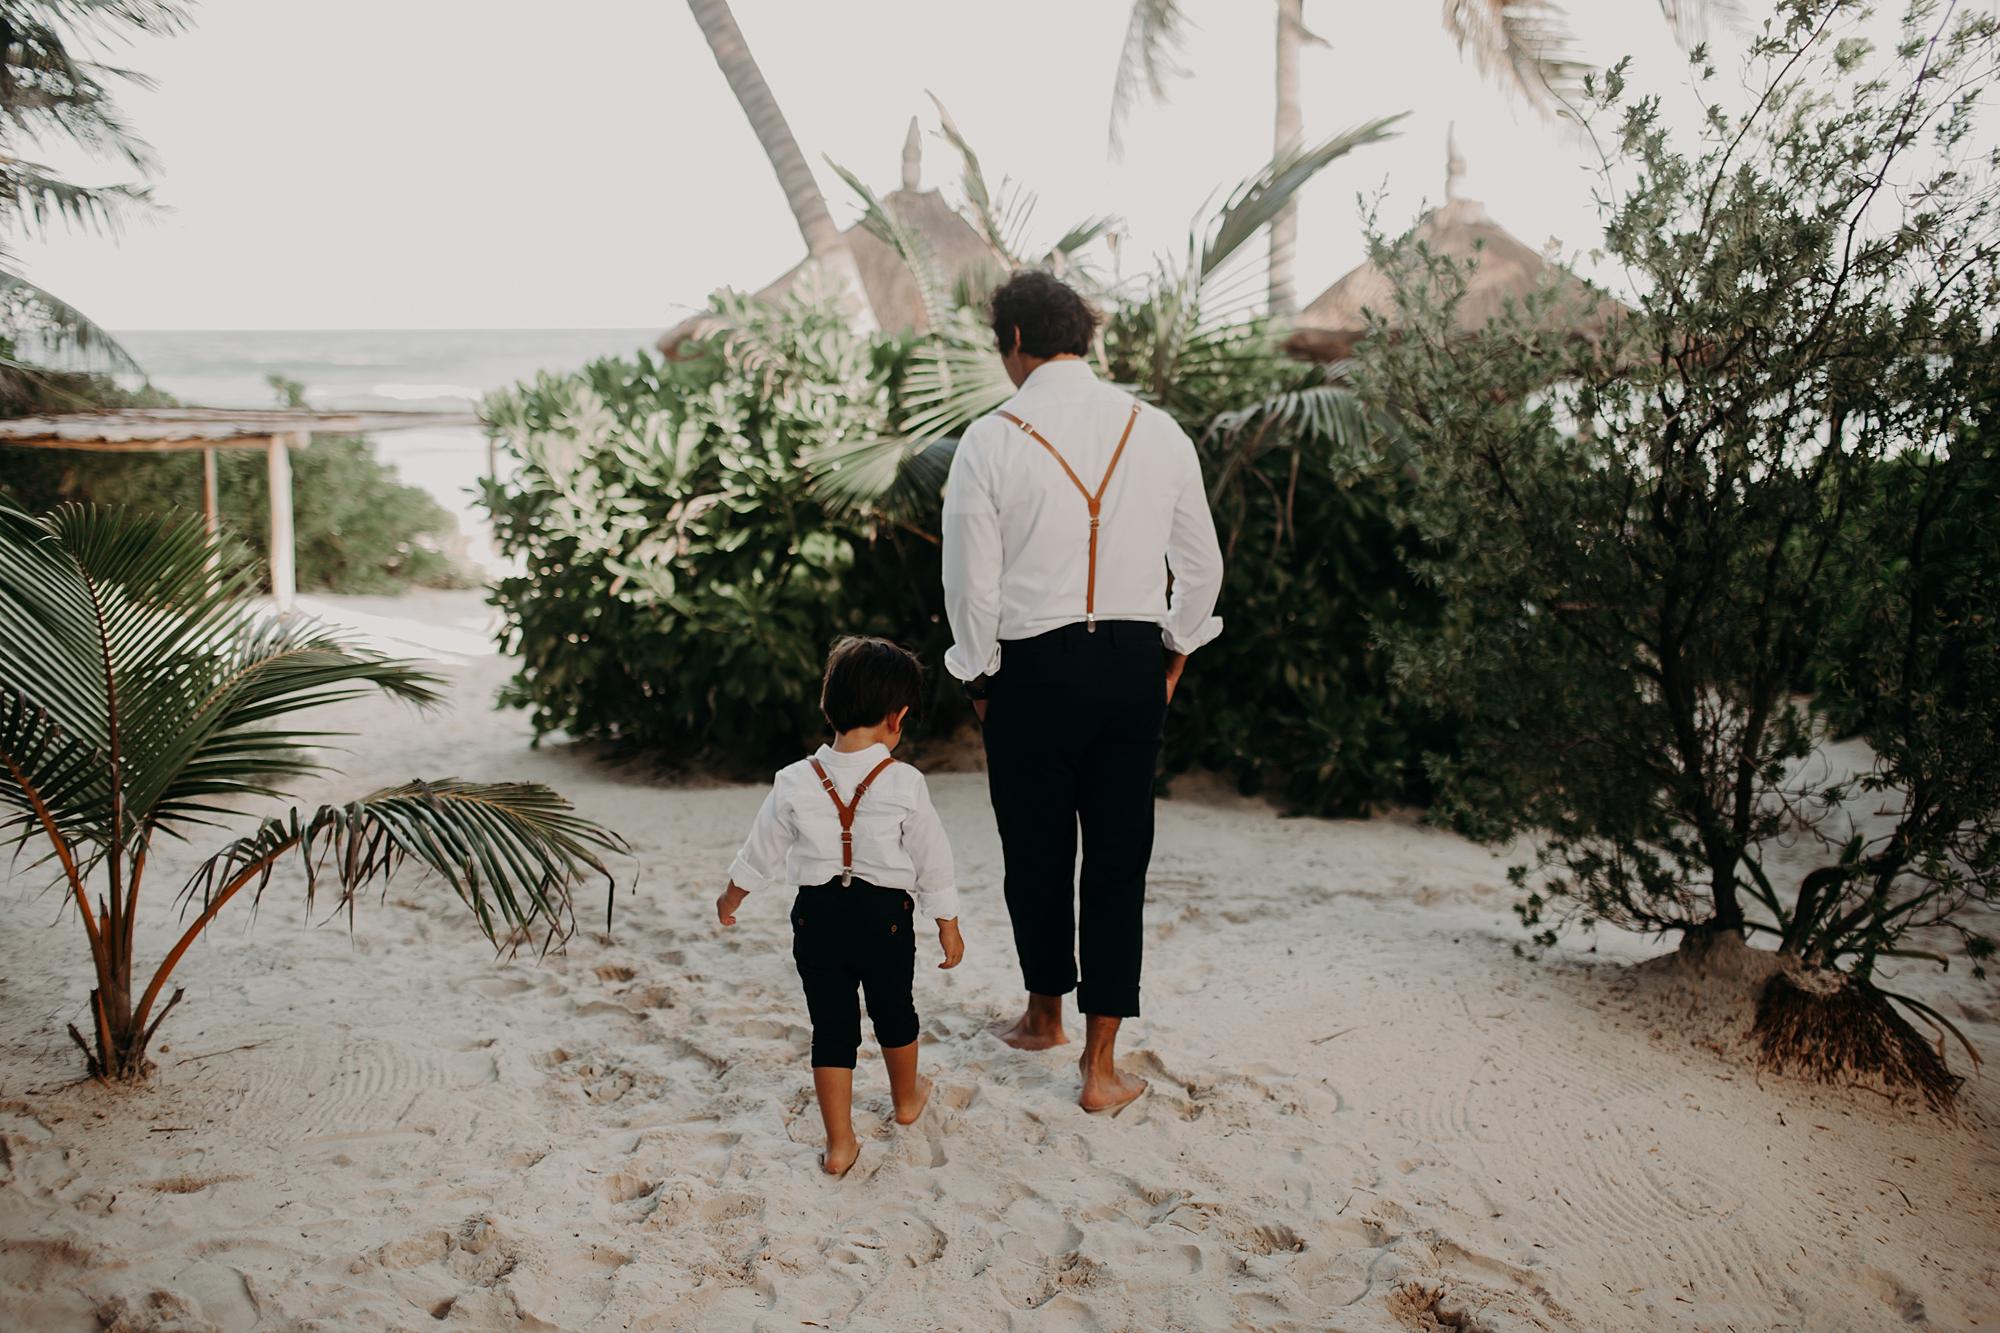 Danielle-San-Antonio-Wedding-Photographer-108_WEB.jpg